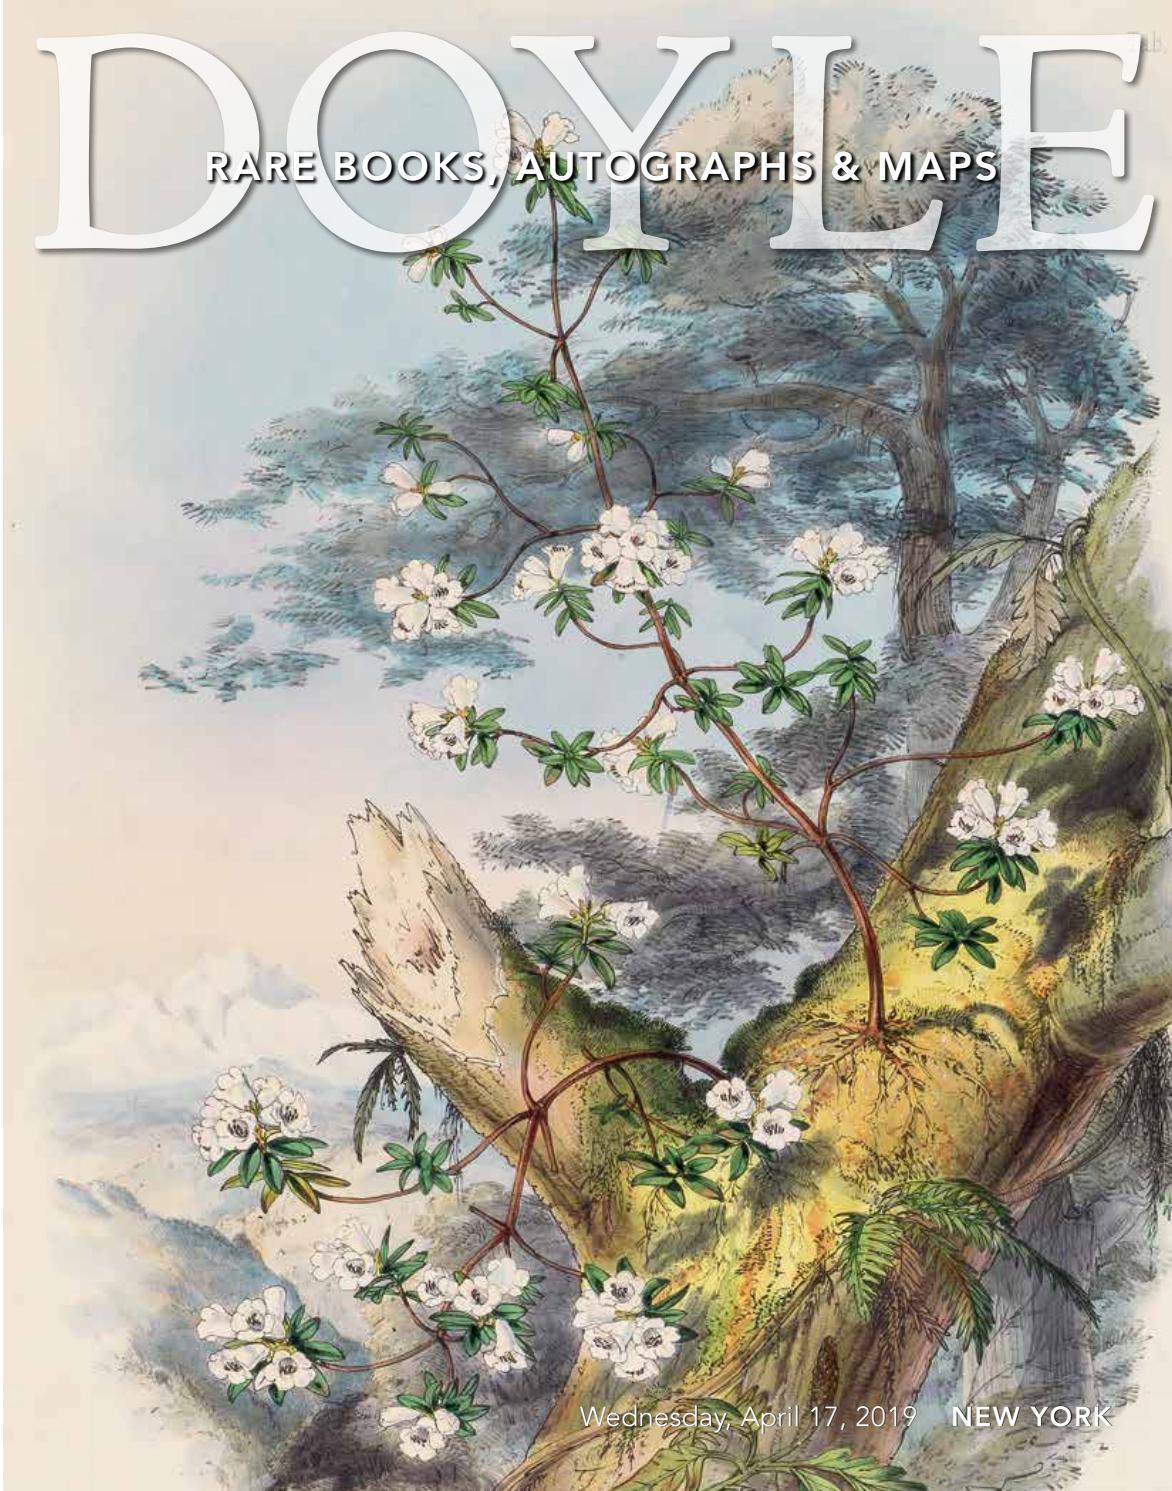 Rare Books, Autographs & Maps - 4.17.19 by Doyle - issuu on